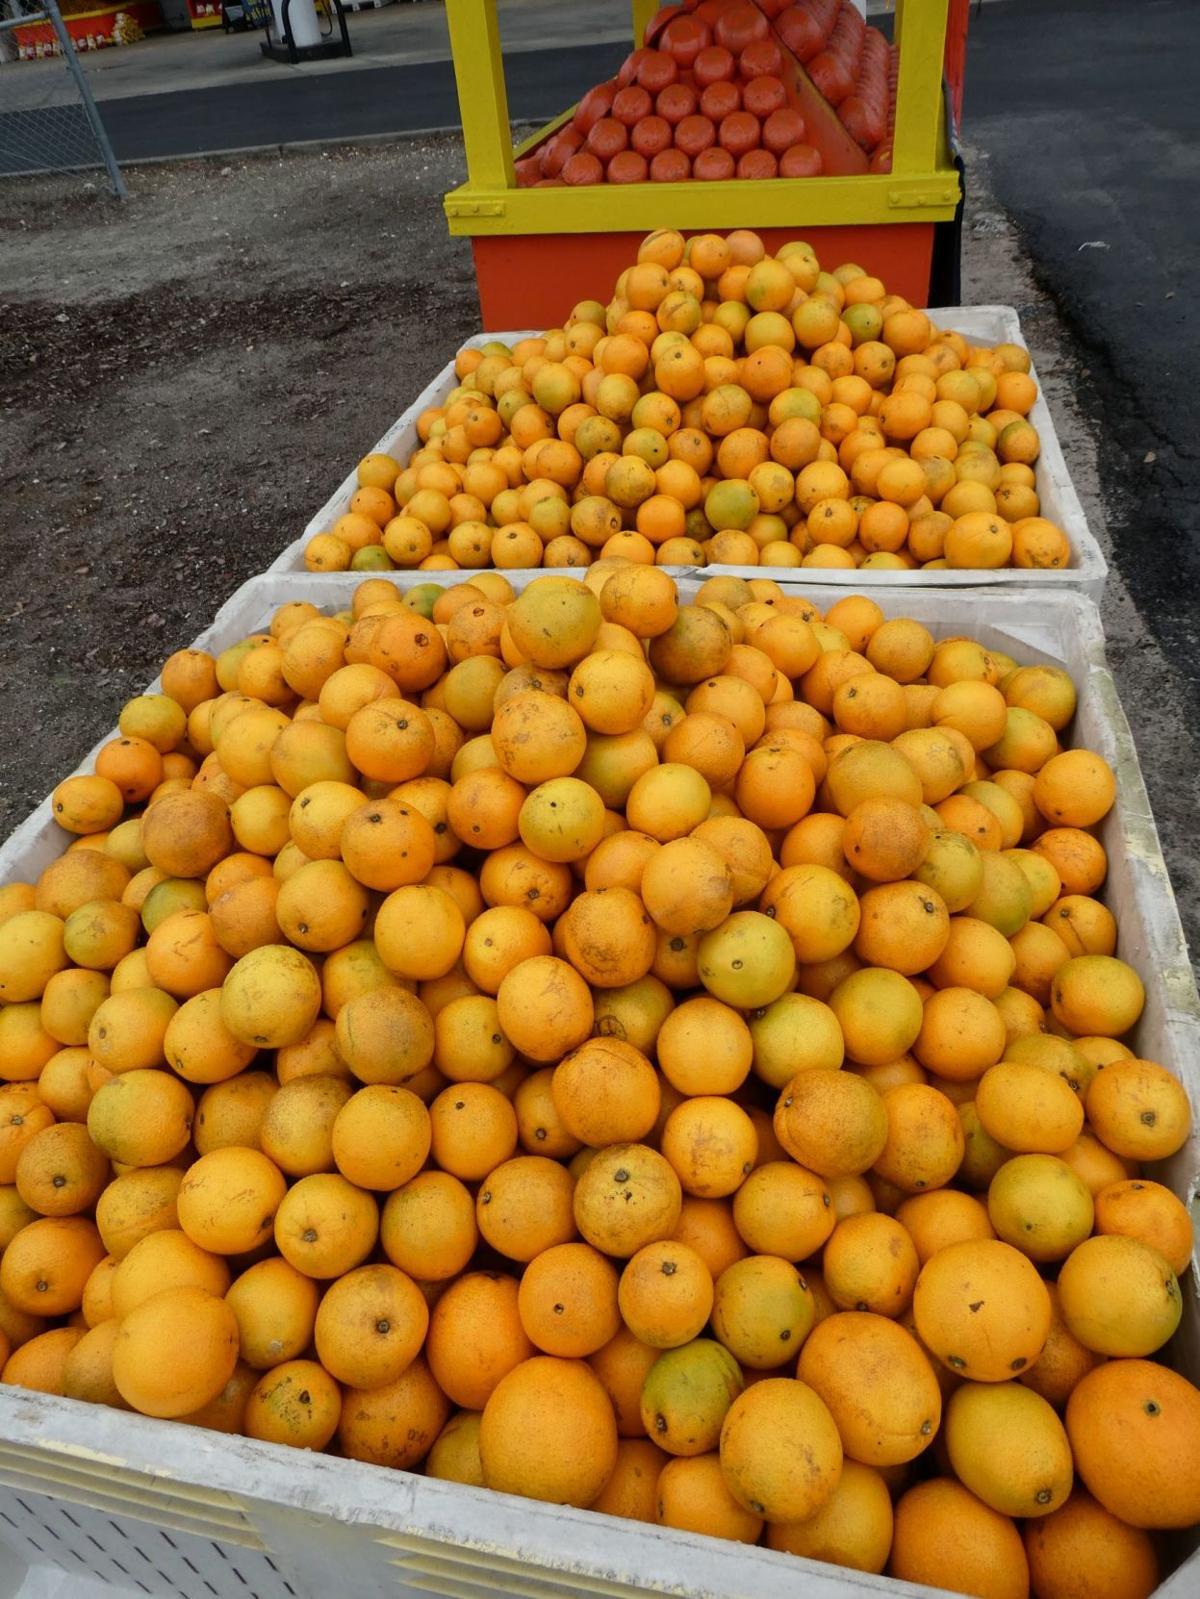 0112 oranges 5.JPG